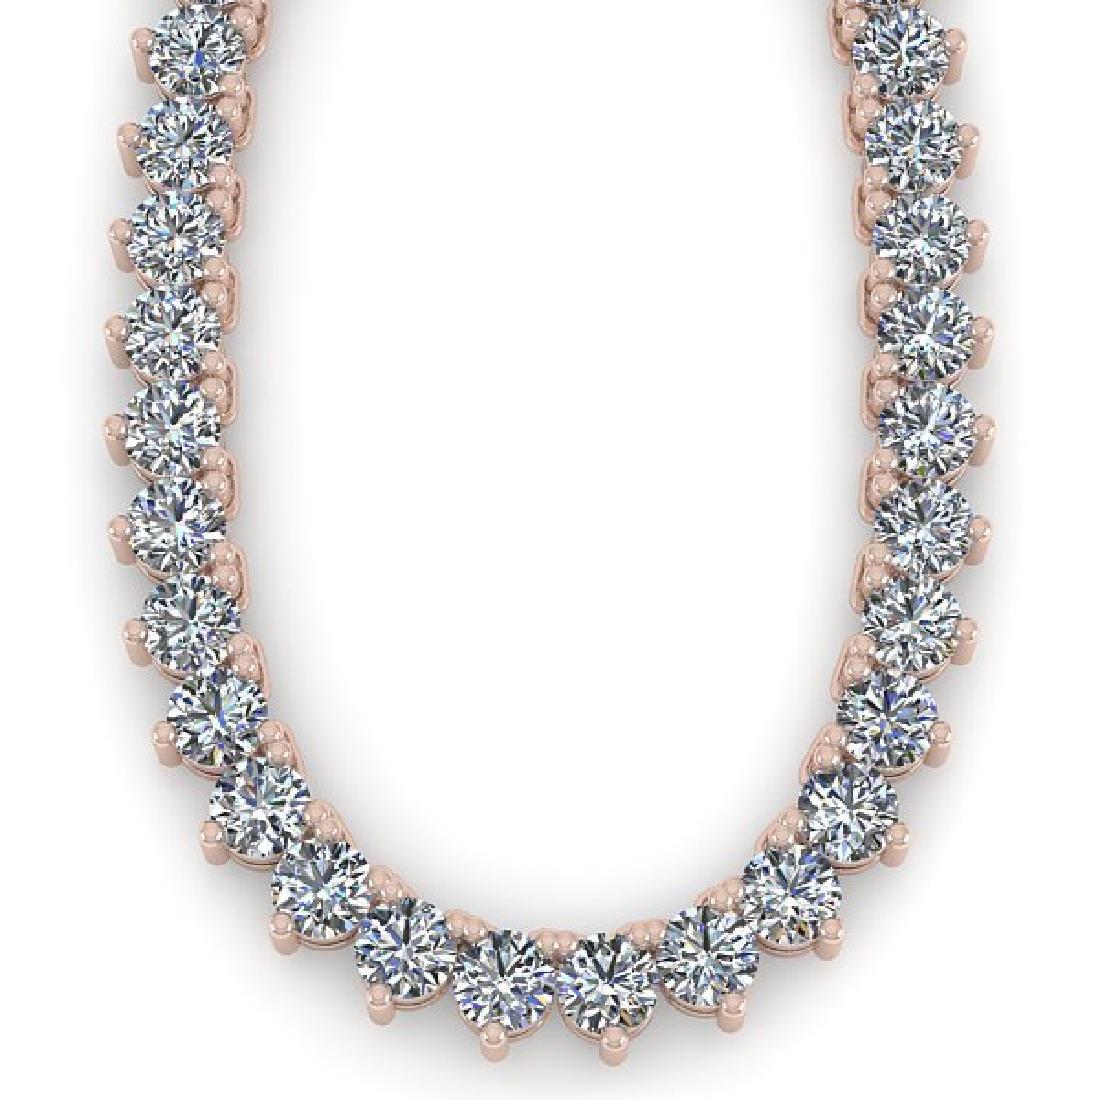 10 CTW Solitaire VS/SI Diamond Necklace 14K Rose Gold - 2